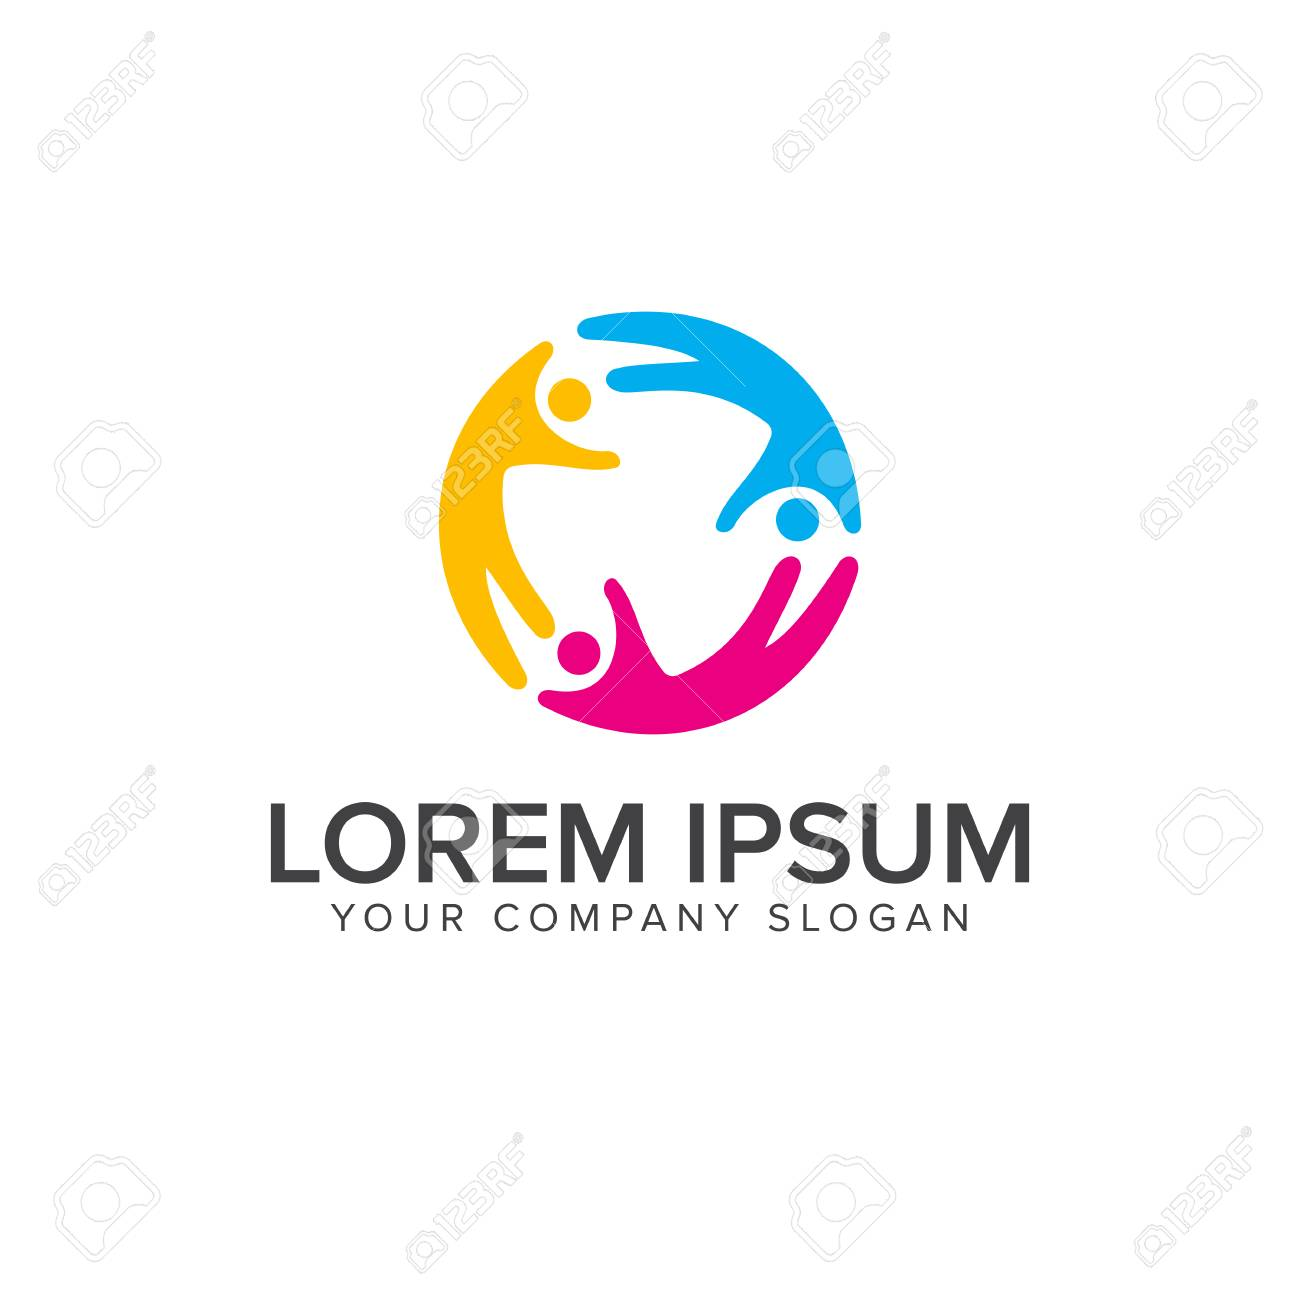 relationship people logos school education logo design concept